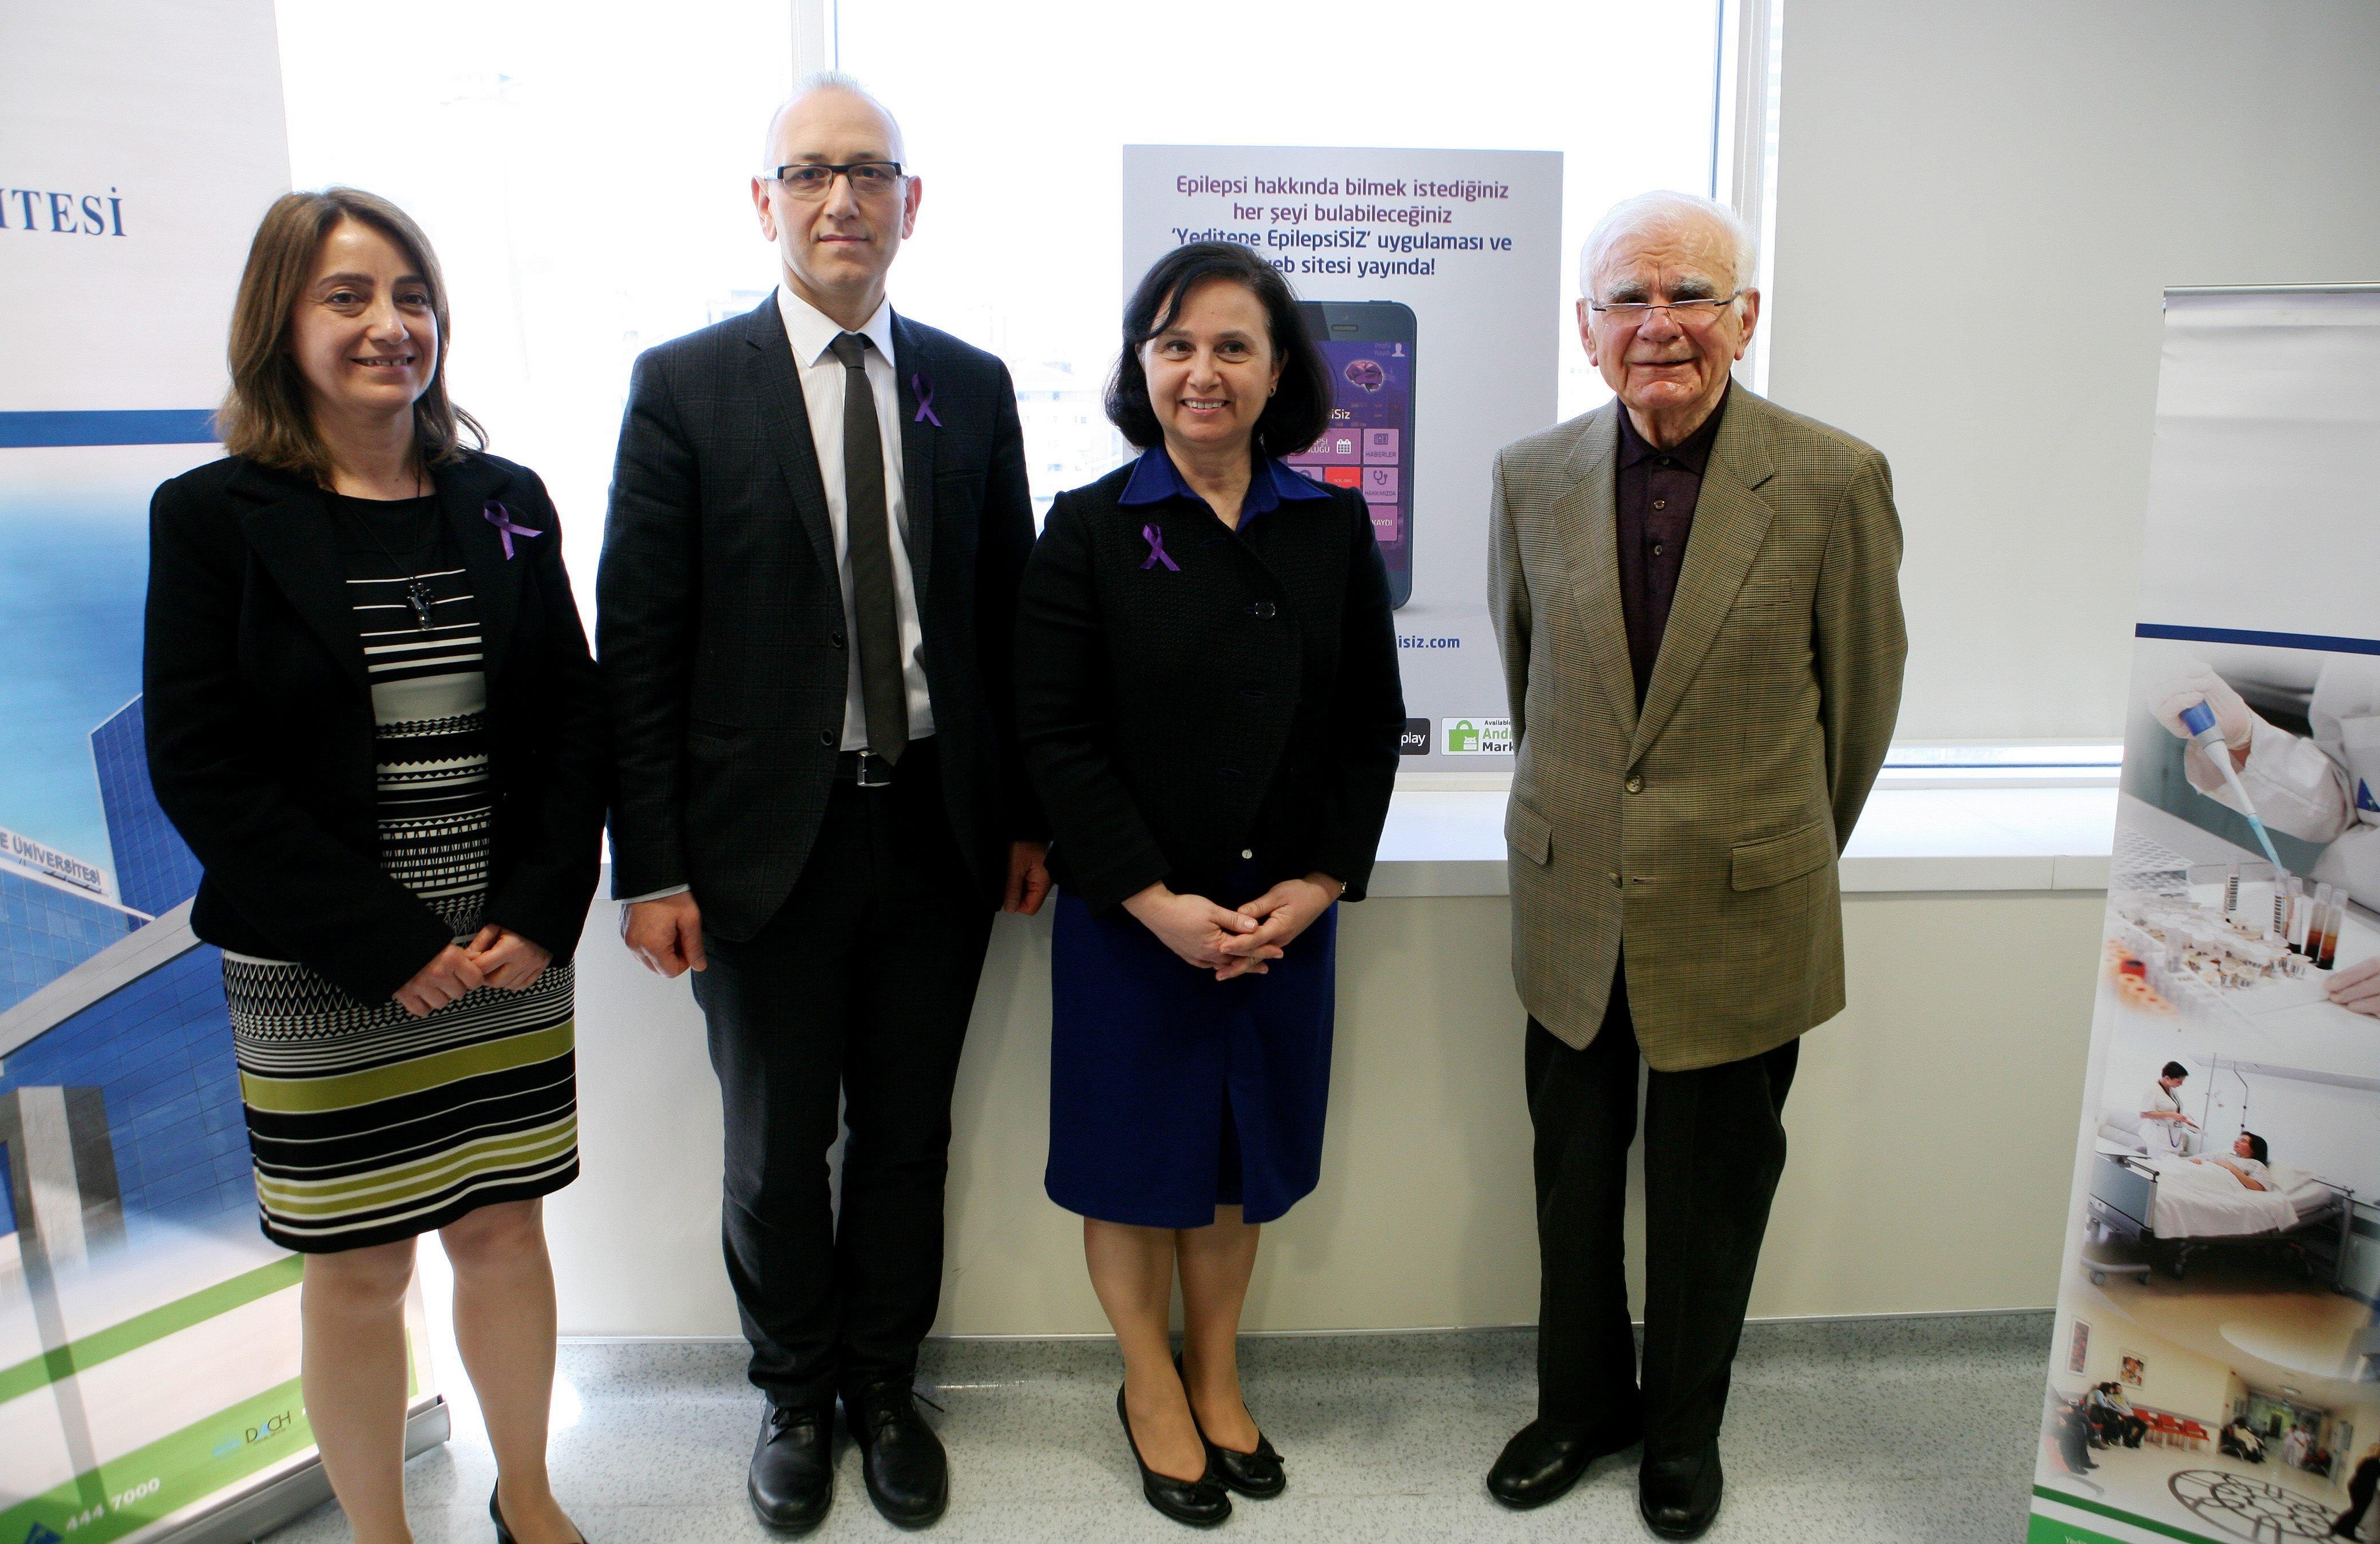 In this undated photo, from left to right, professor Berrin Aktekin, associate professor Faruk Yençilkek, professor Canan Aykut Bingöl and professor Gazi Yaşargil pose at Yeditepe University. (Photo by Erdoğan Yapık)